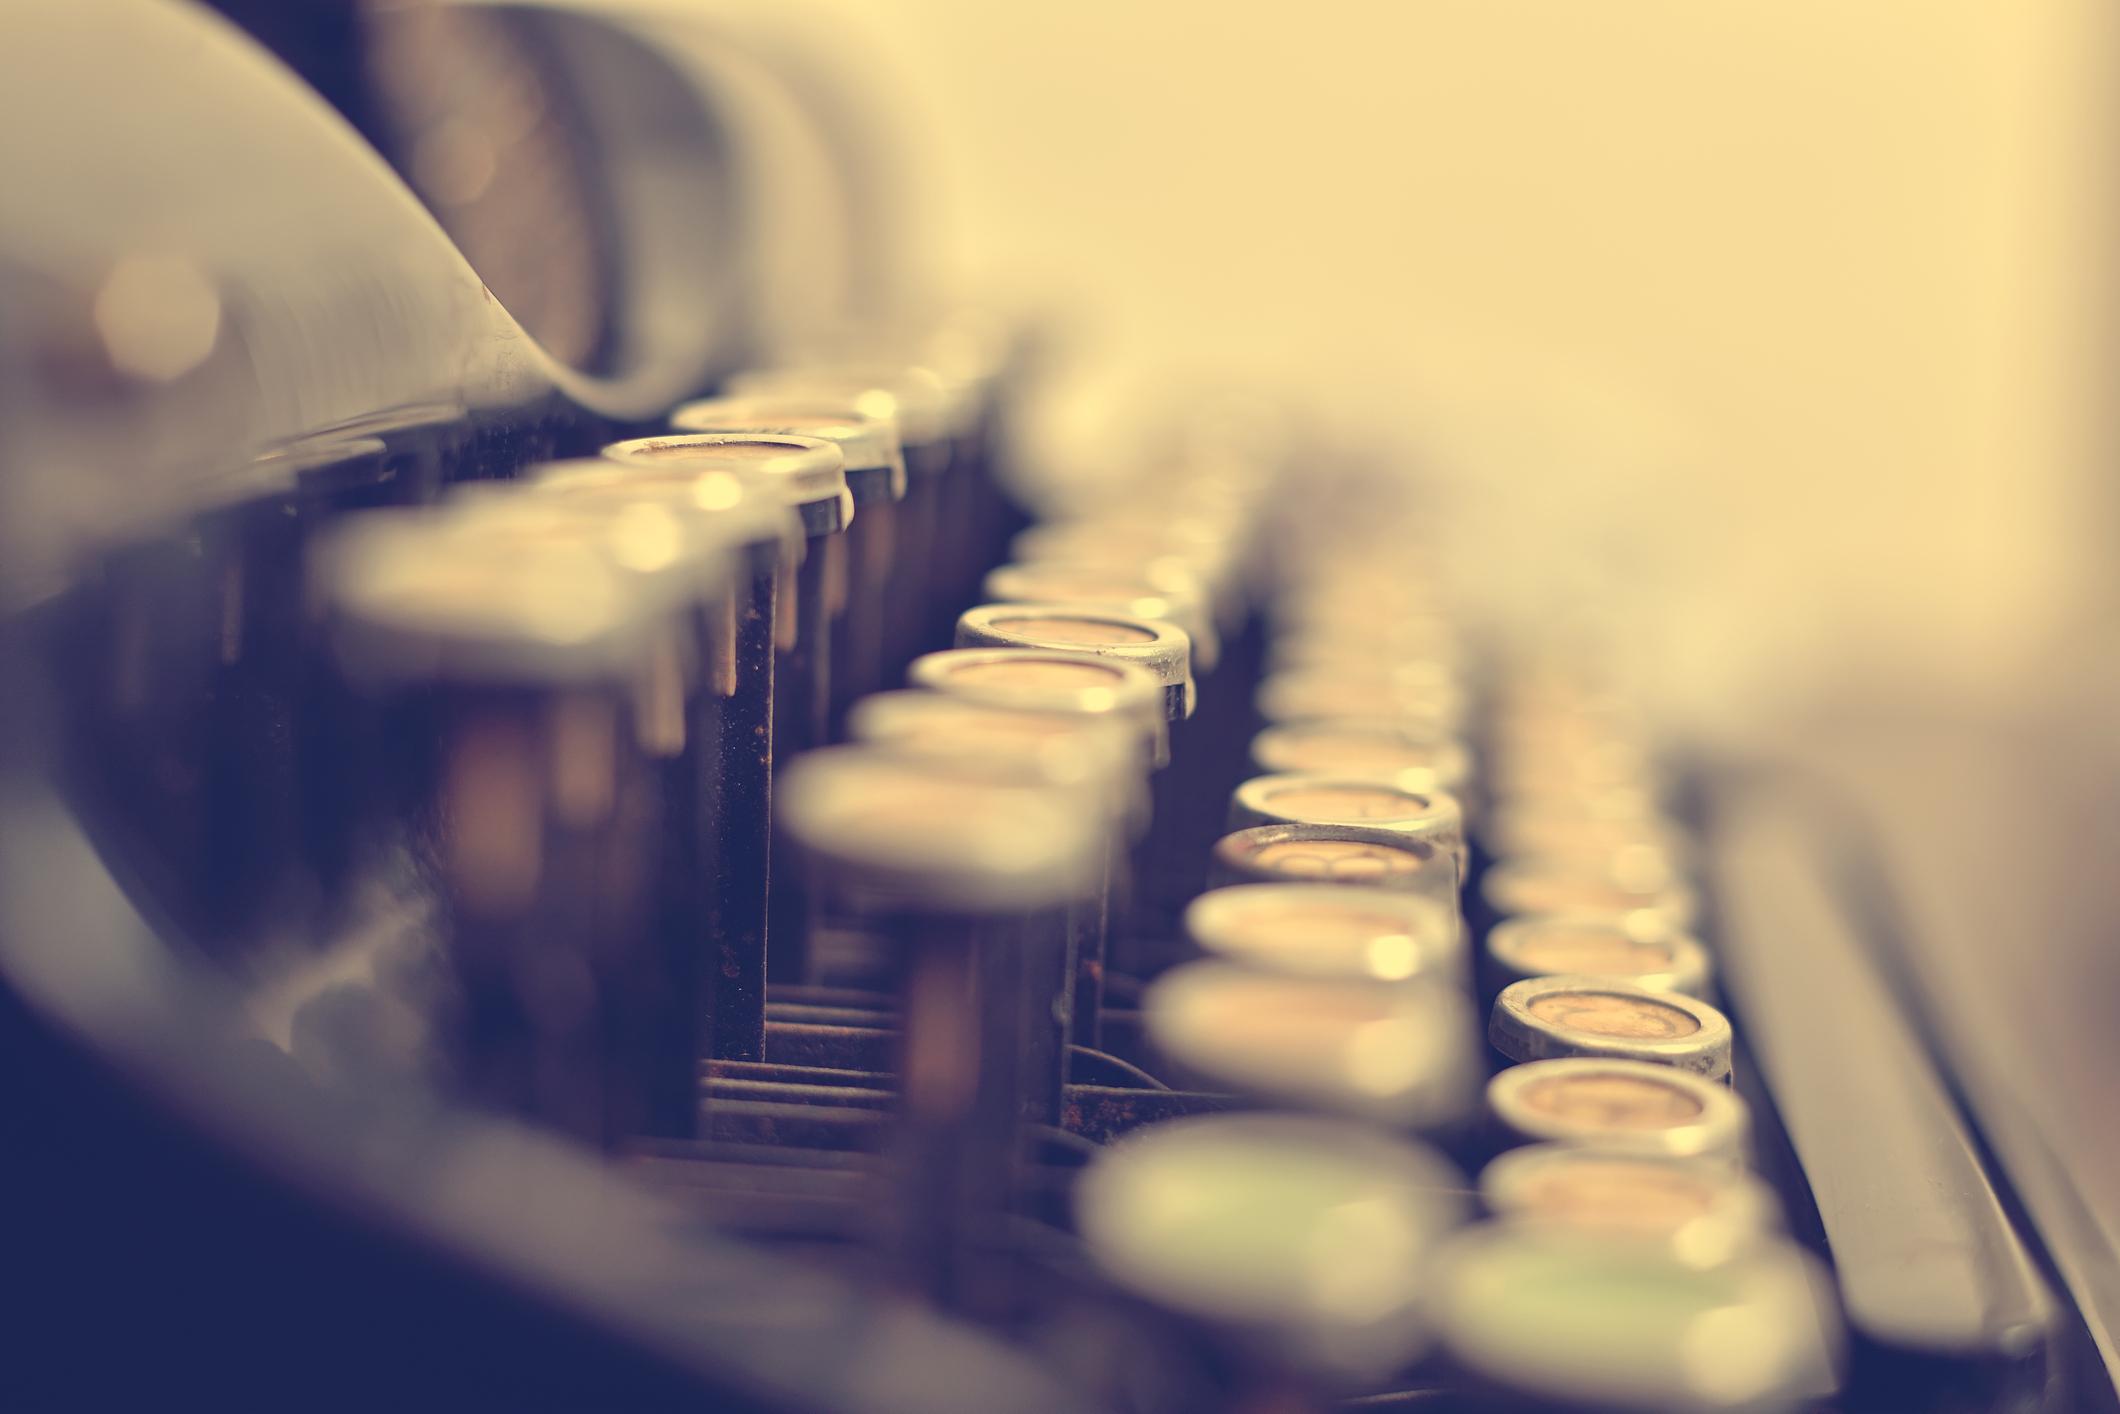 Old typewriter keyboard in vintage color tone